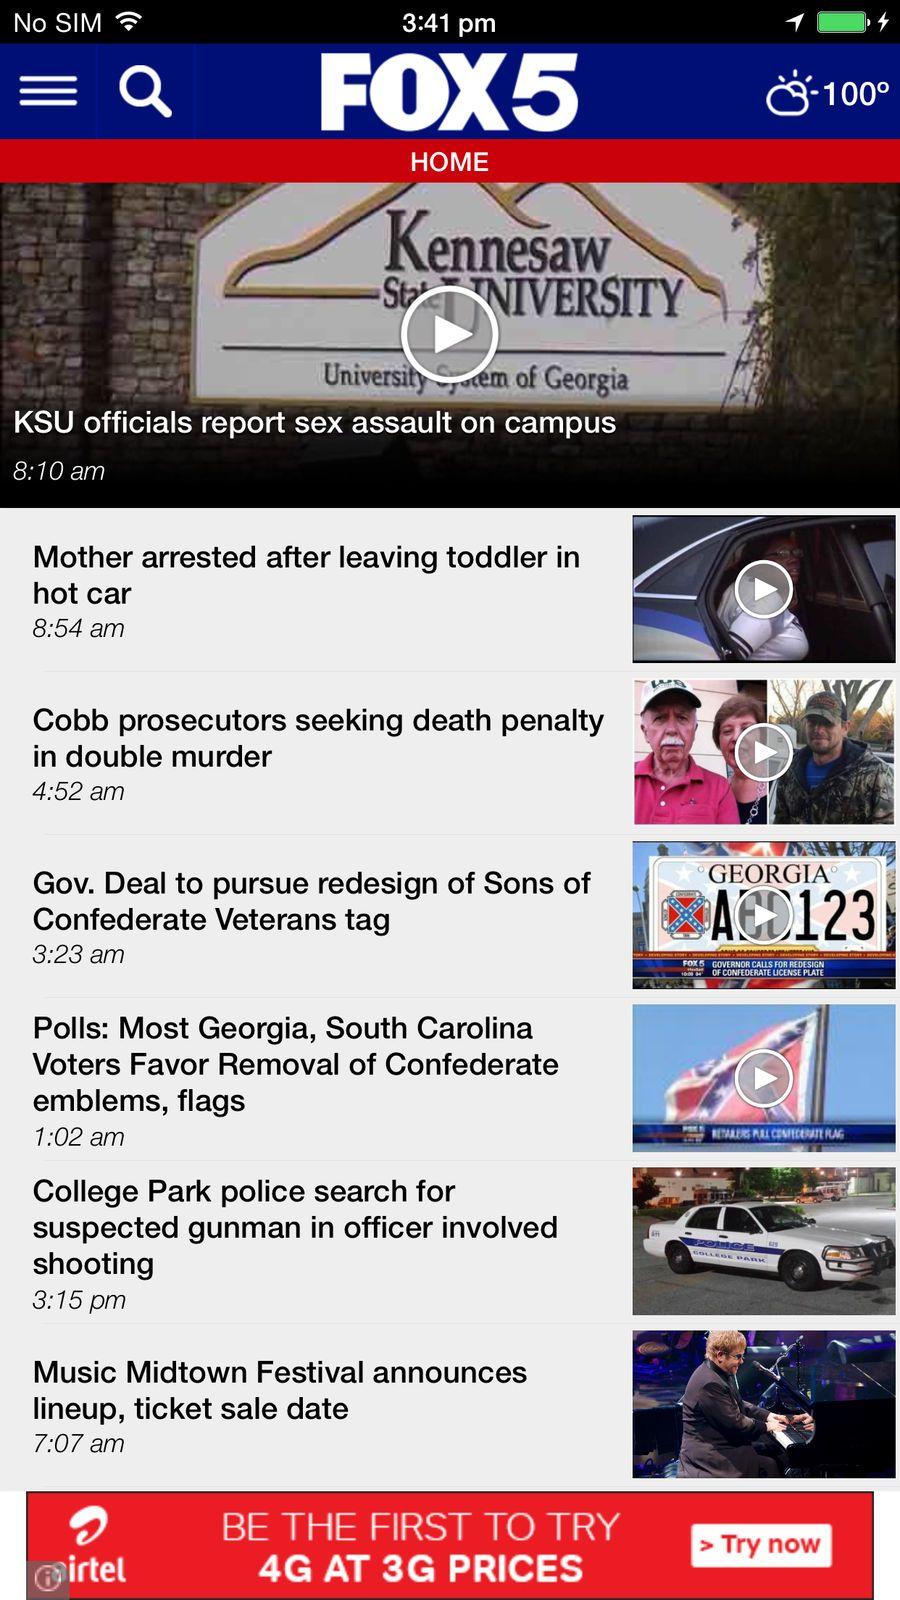 FOX 5 Atlanta #Weather#News#apps#ios | Apple Game Plays | App, News